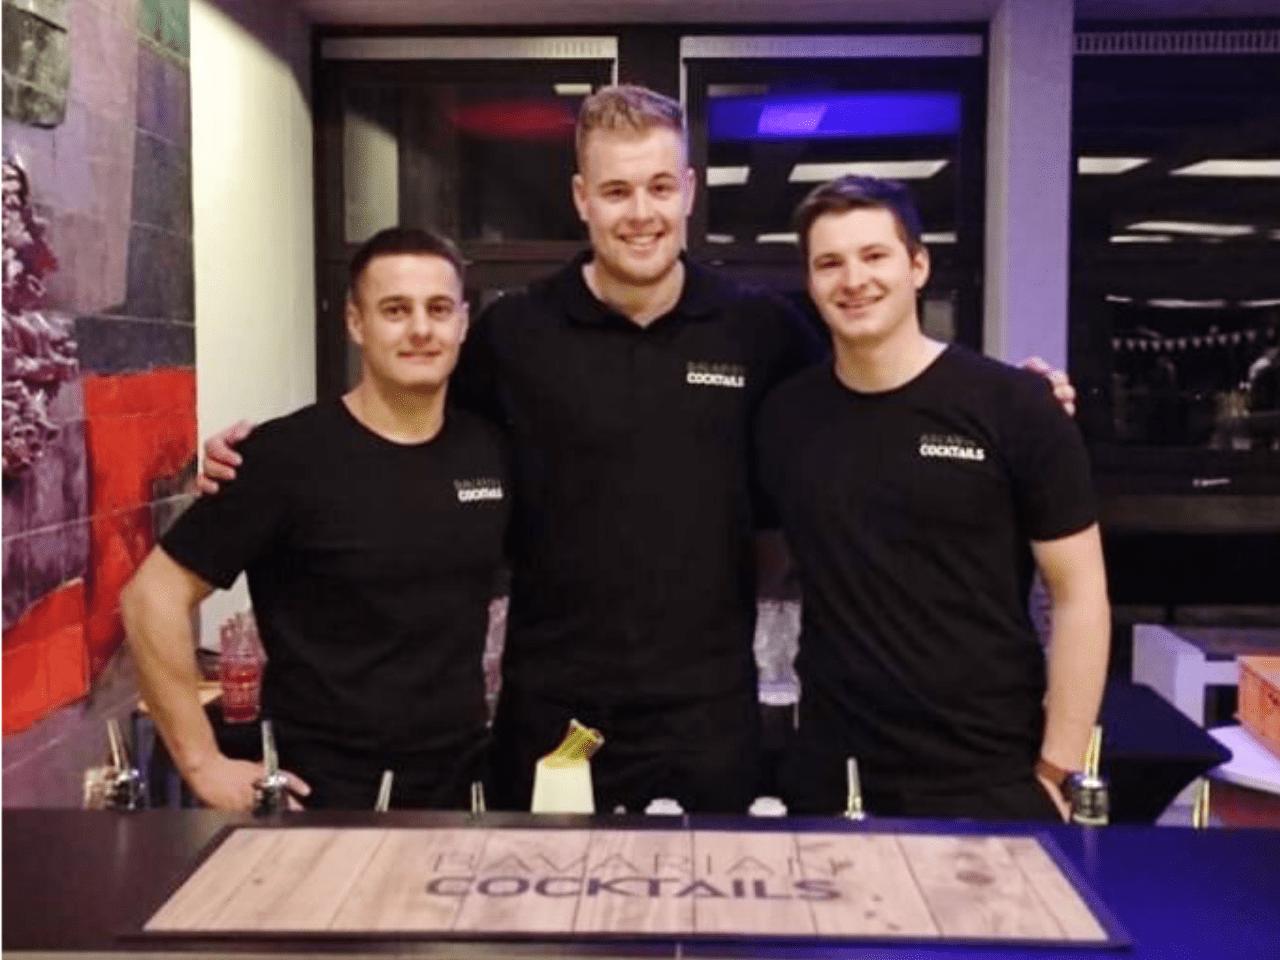 Team Bavarian Cocktails